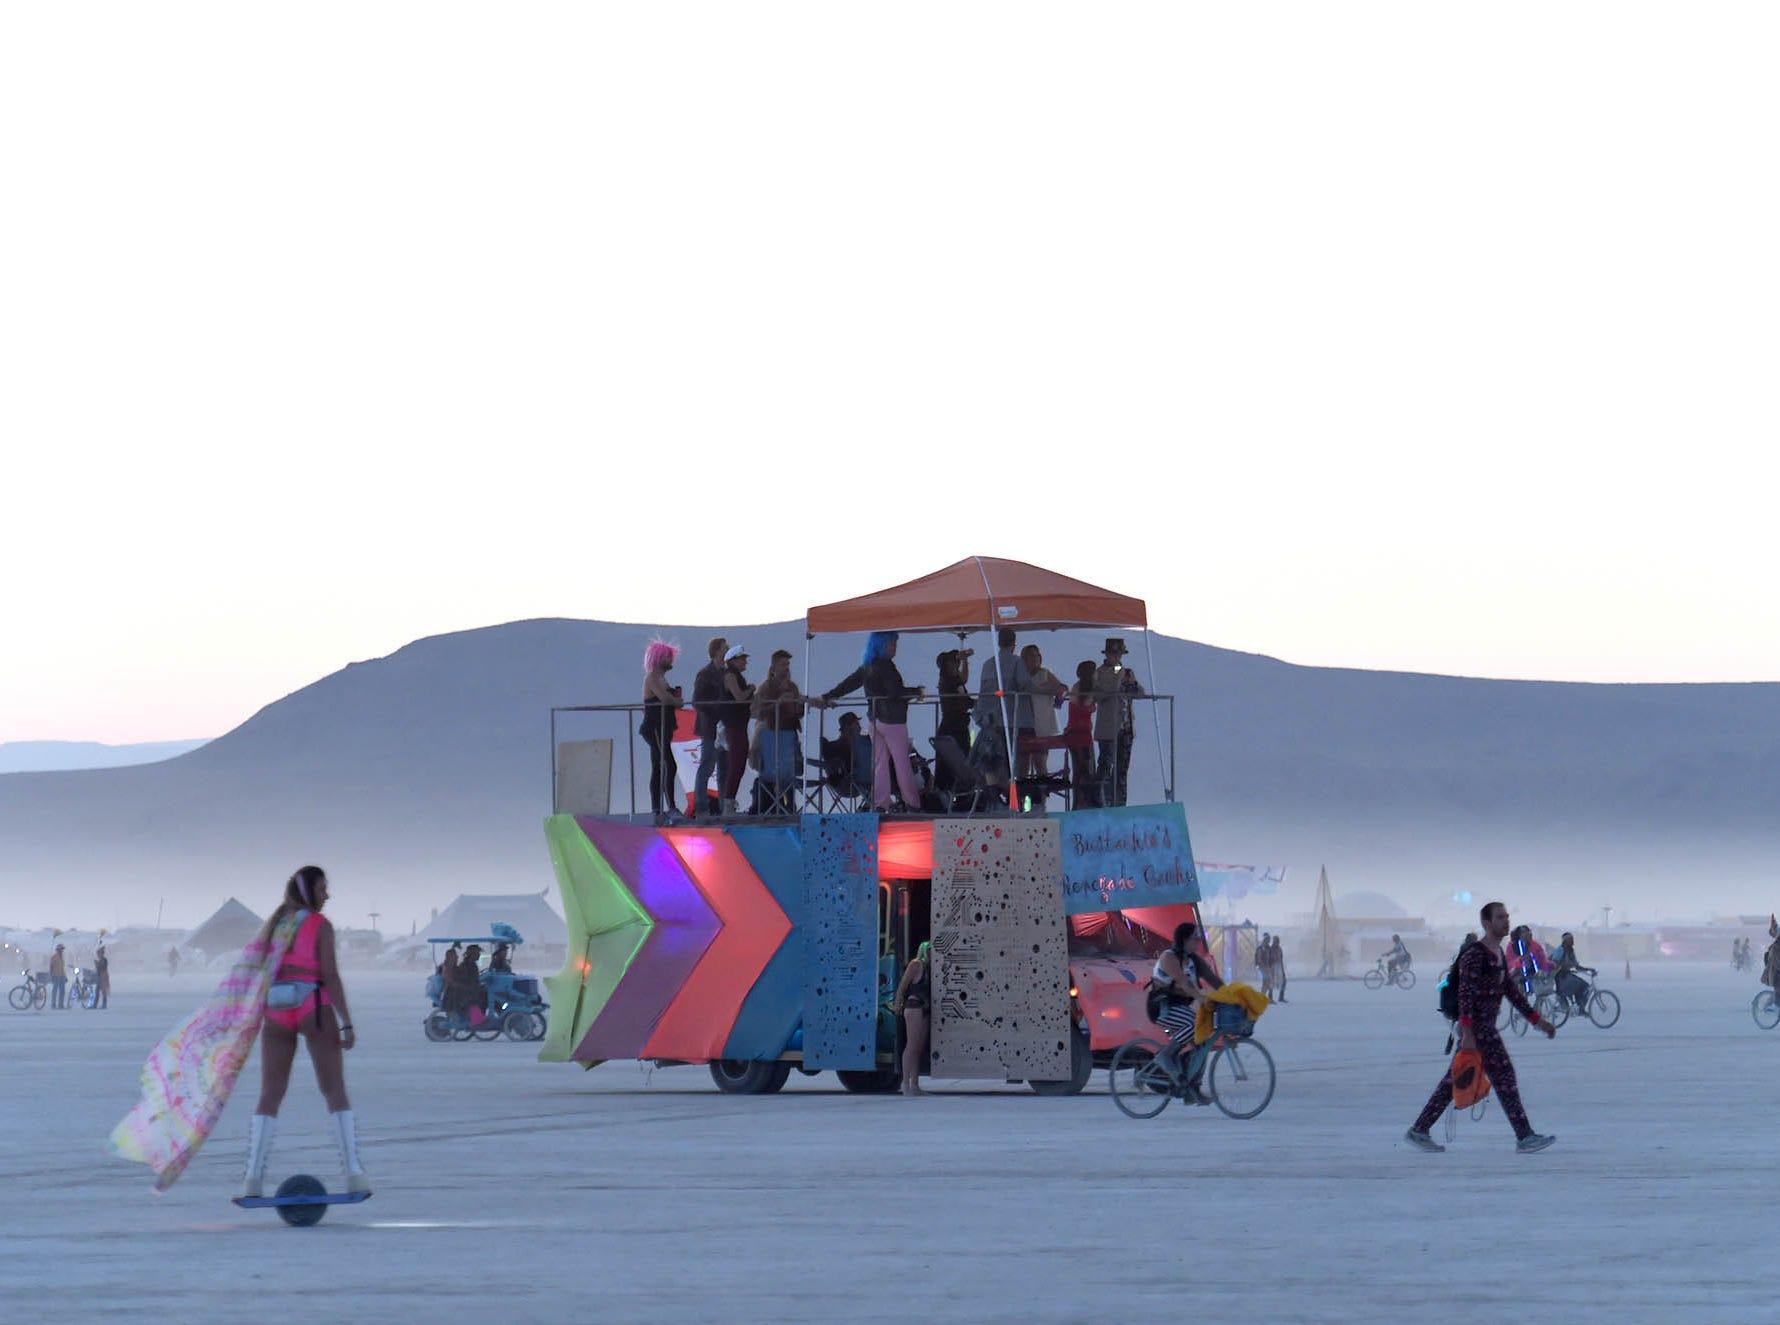 A photo from Saturday, Sept. 1, 2018 at Burning Man.